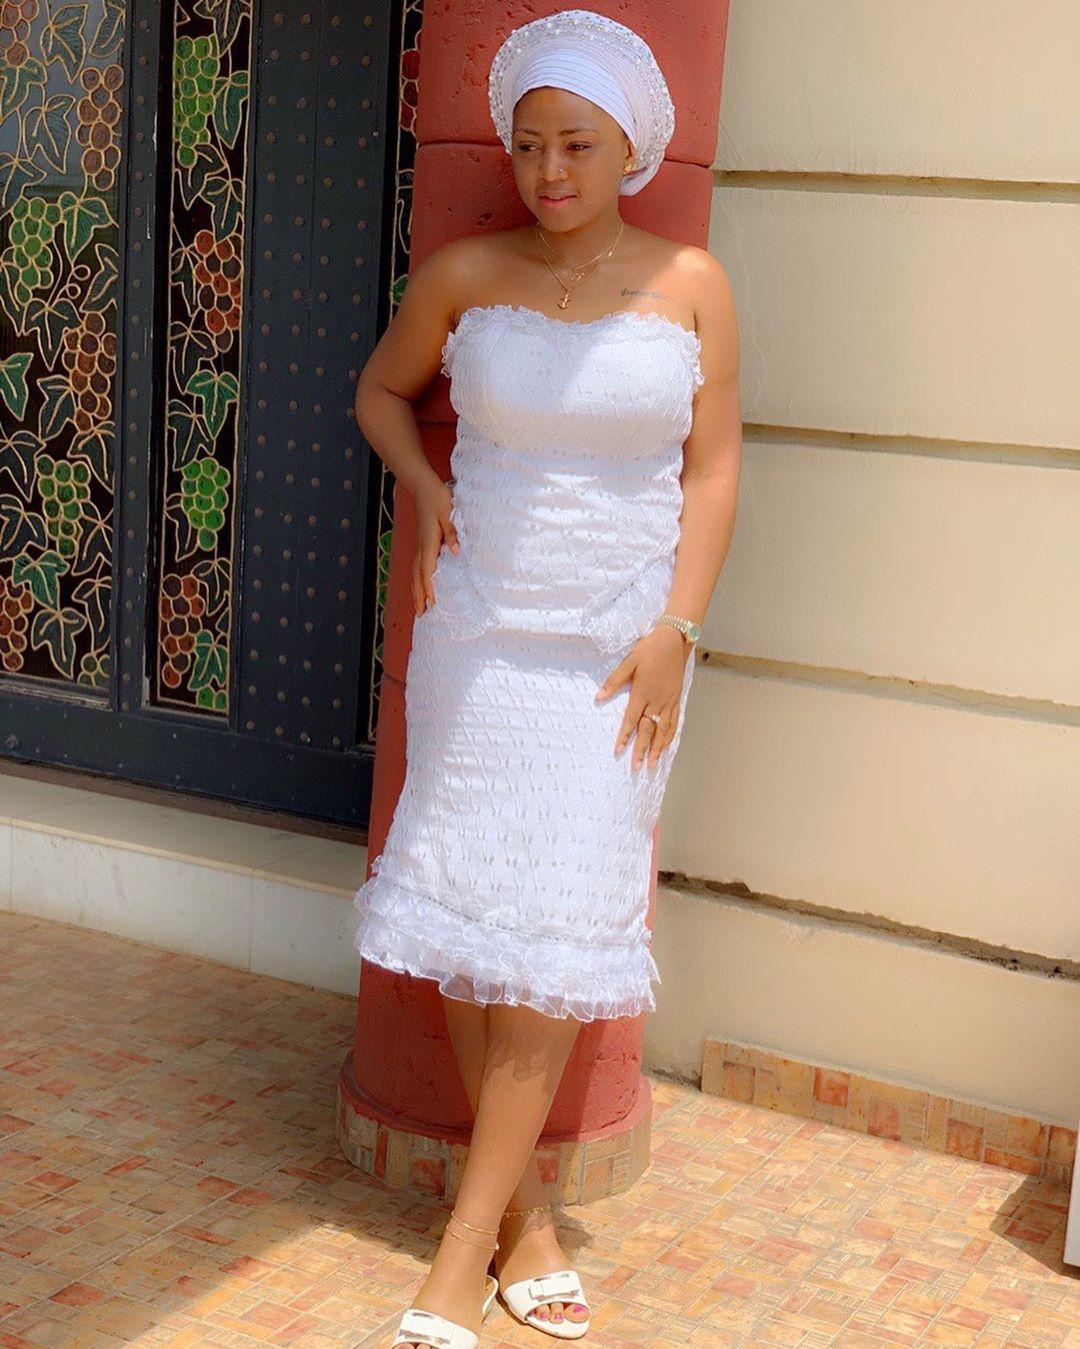 9588471 regg jpeg62d87bc5529fecd8589f9fadf865639d - [Photos] Regina Daniels Looks Stunning As She Rocks Traditional Attire